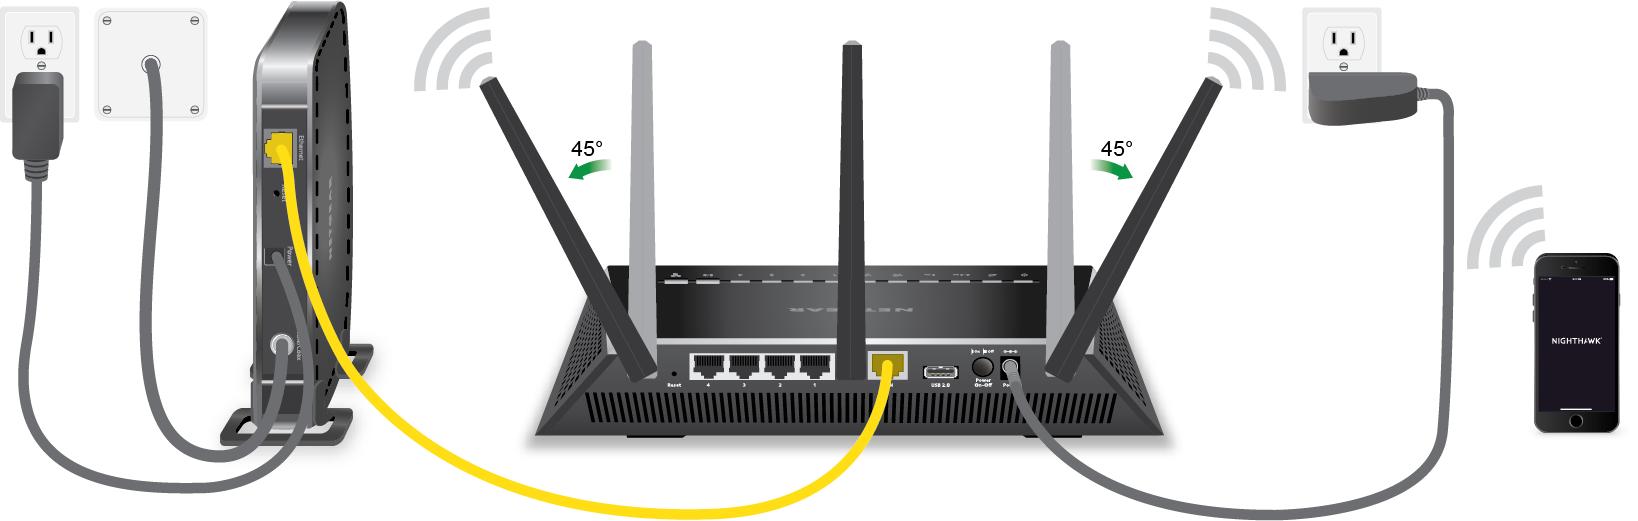 How do I set up and install my NETGEAR router? | Answer | NETGEAR Support | Gear Router Wiring Diagram |  | Welcome to NETGEAR Support - Netgear